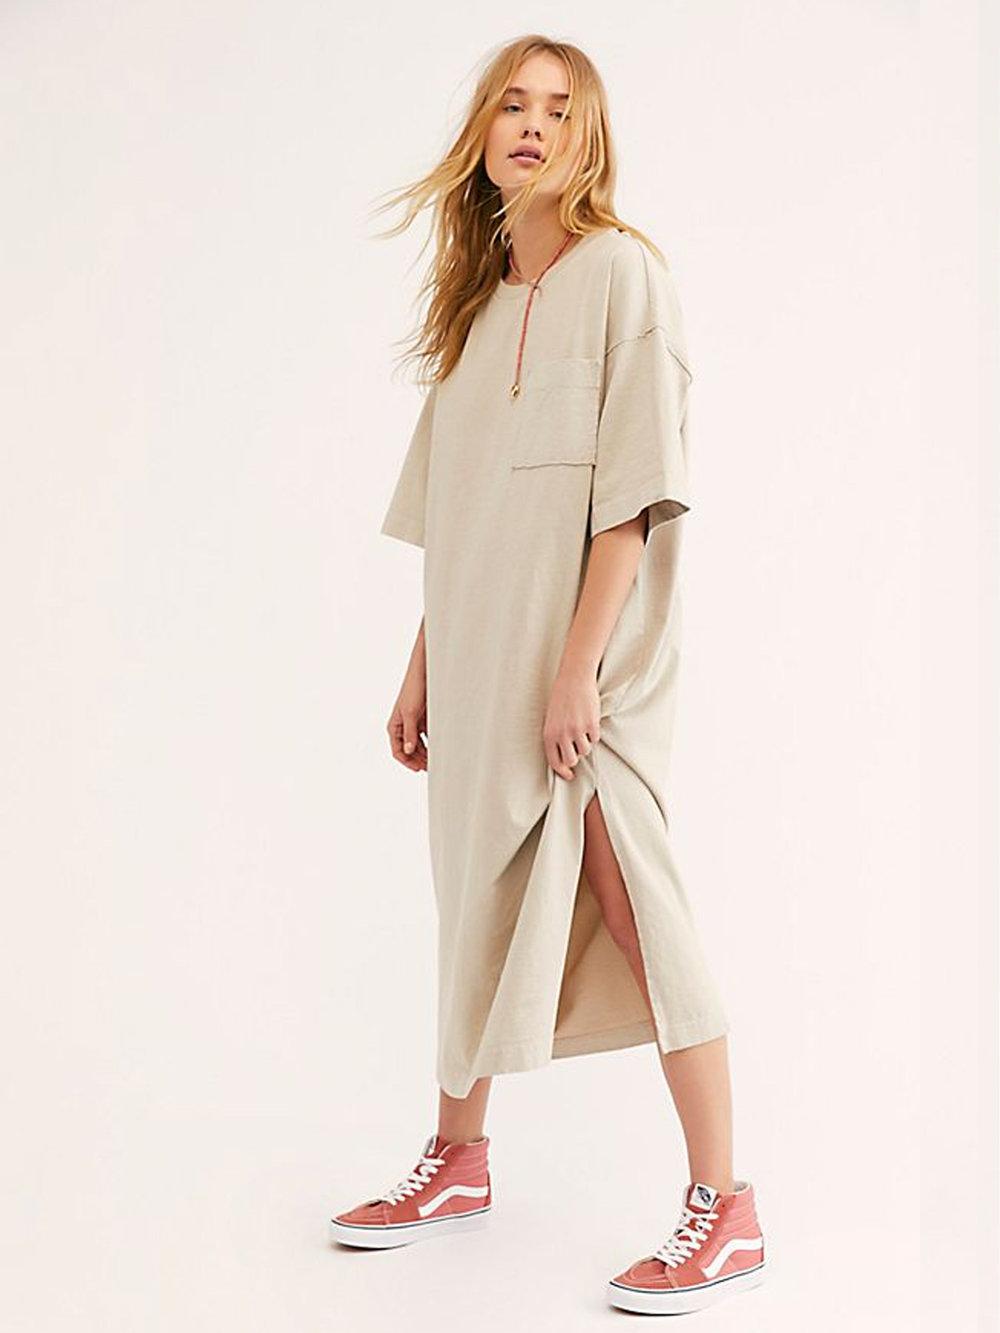 Camilla Shirtdress, $70